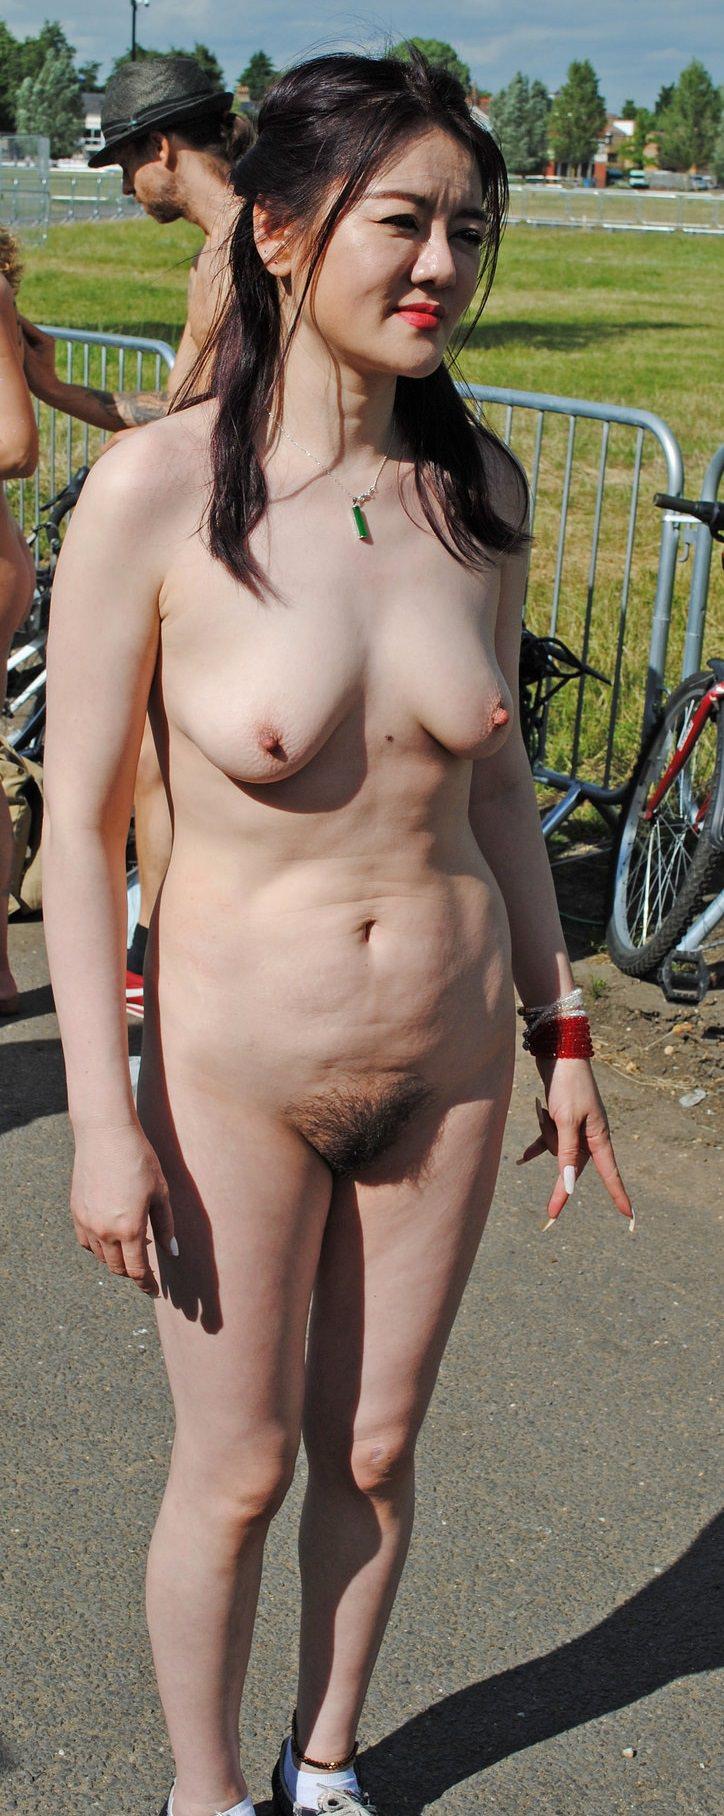 Asian Woman Naked